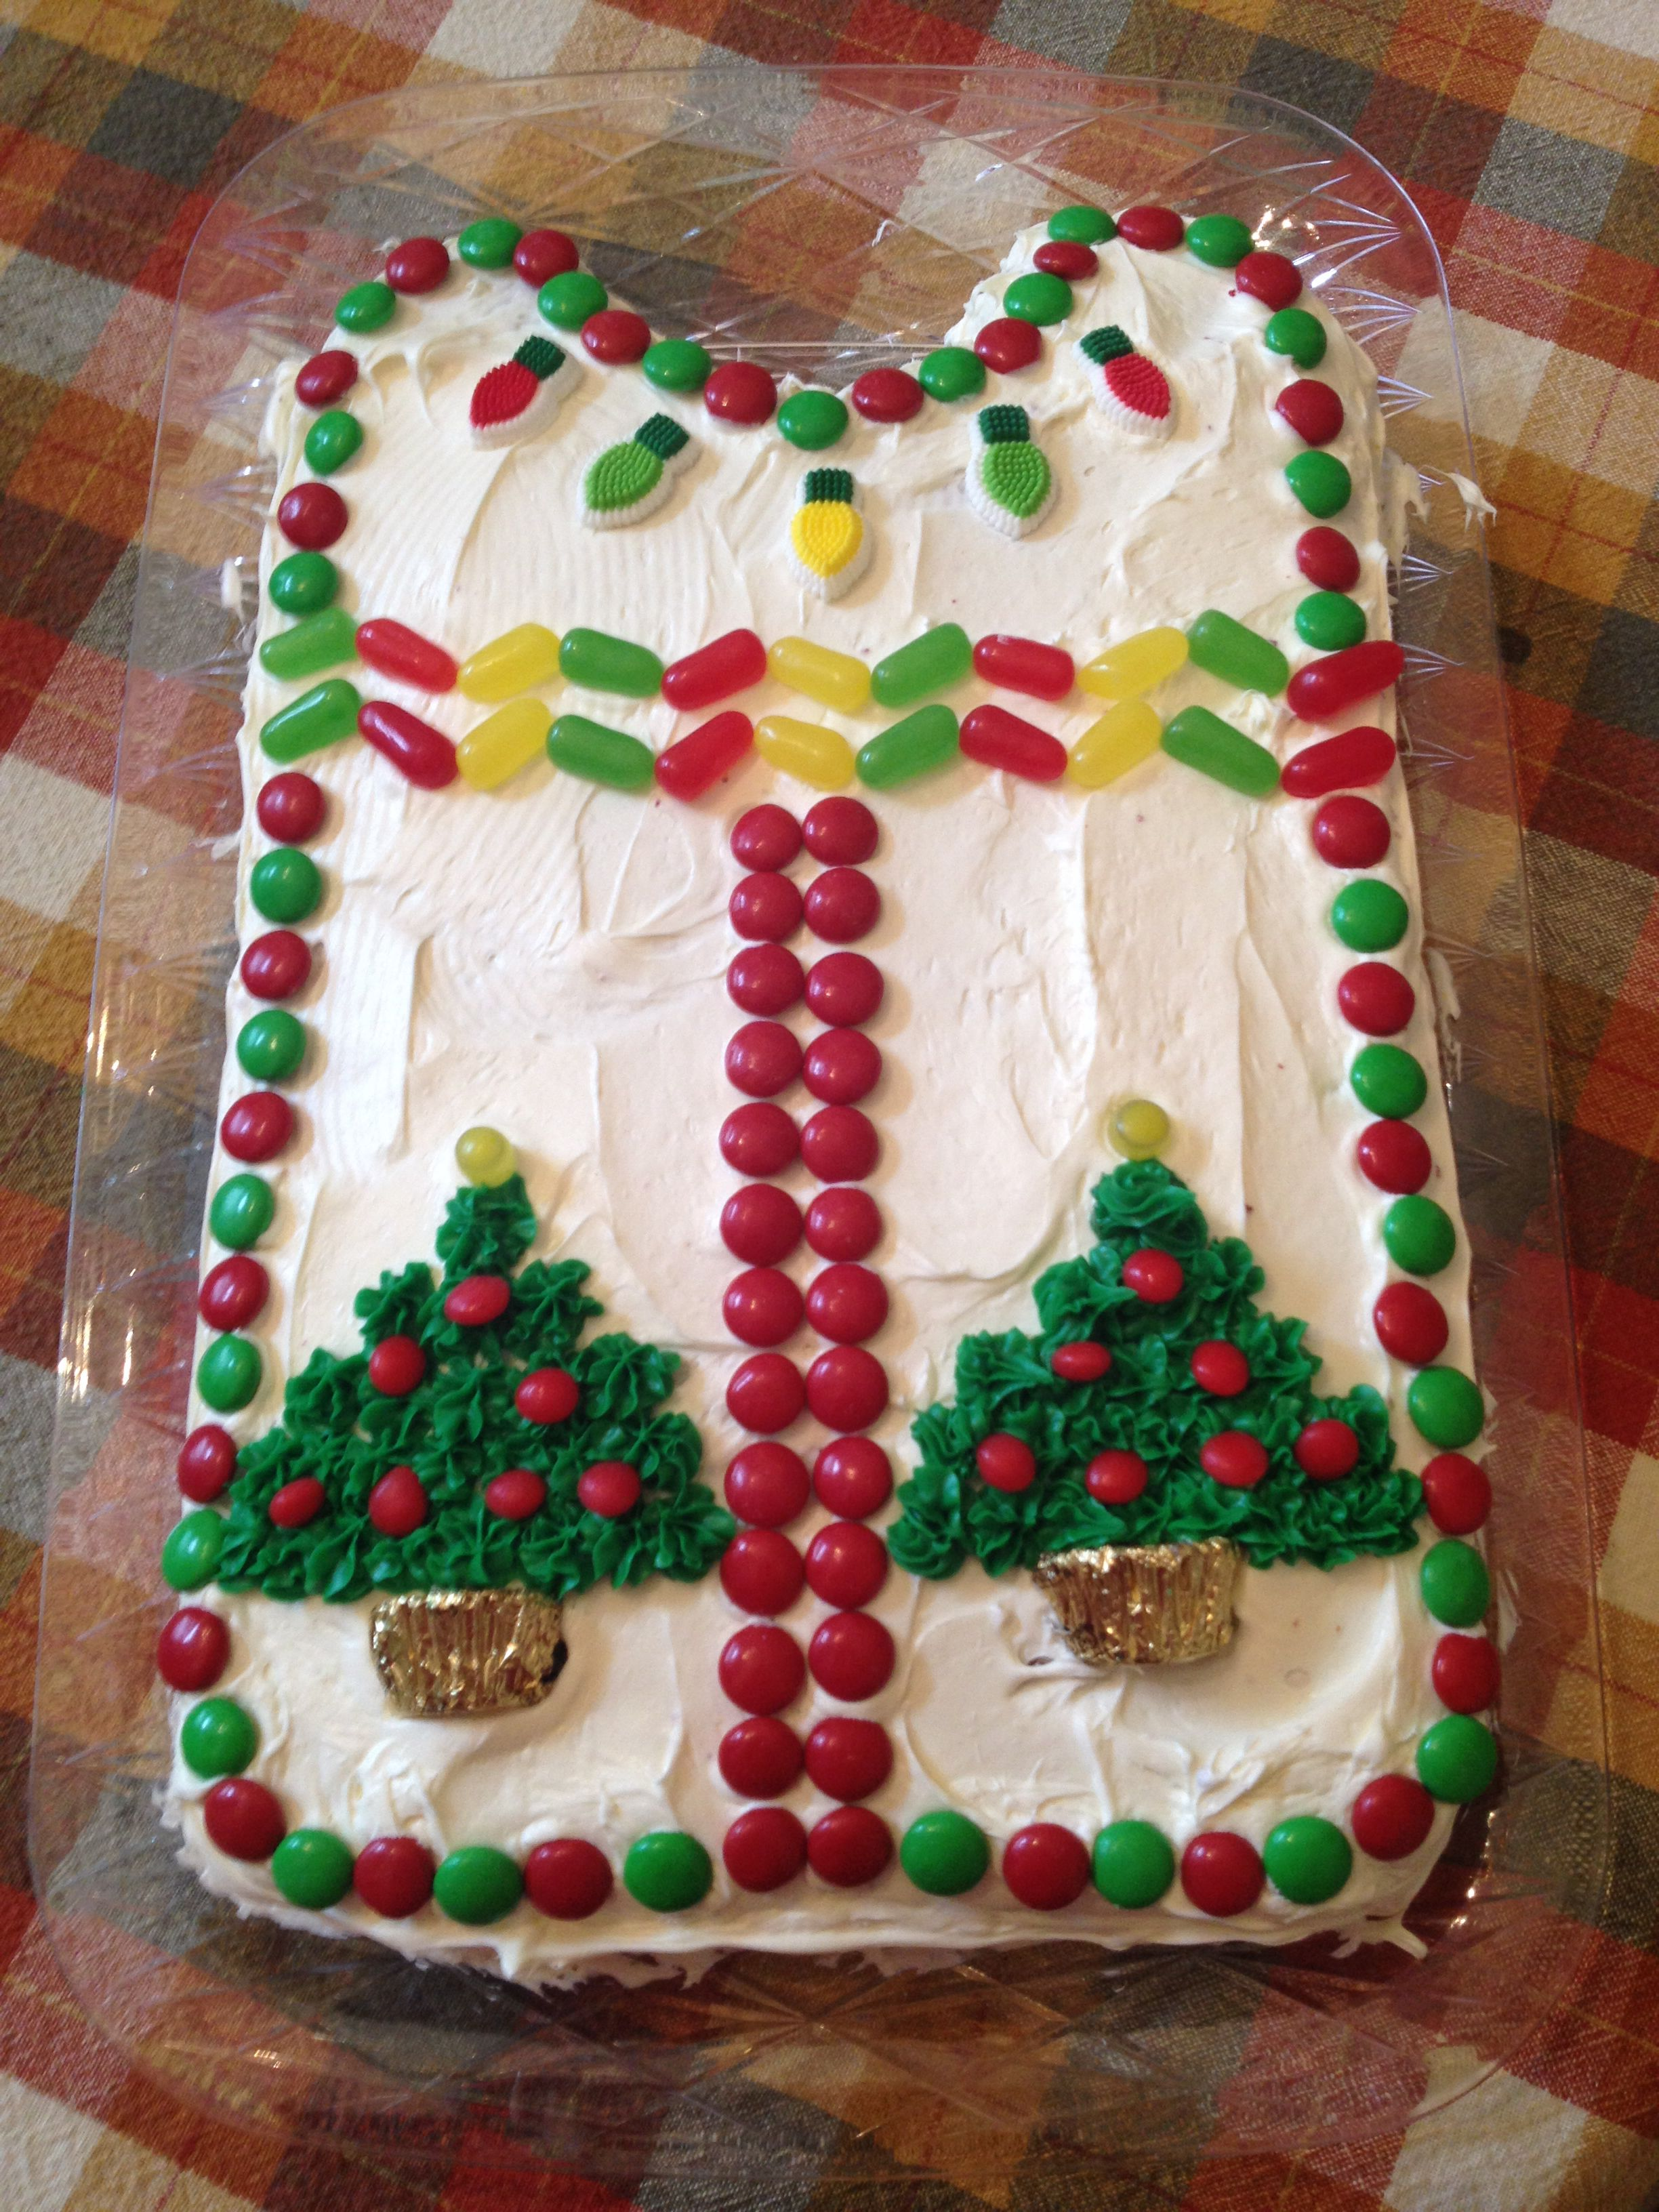 Fancy Cake Decorating Ideas